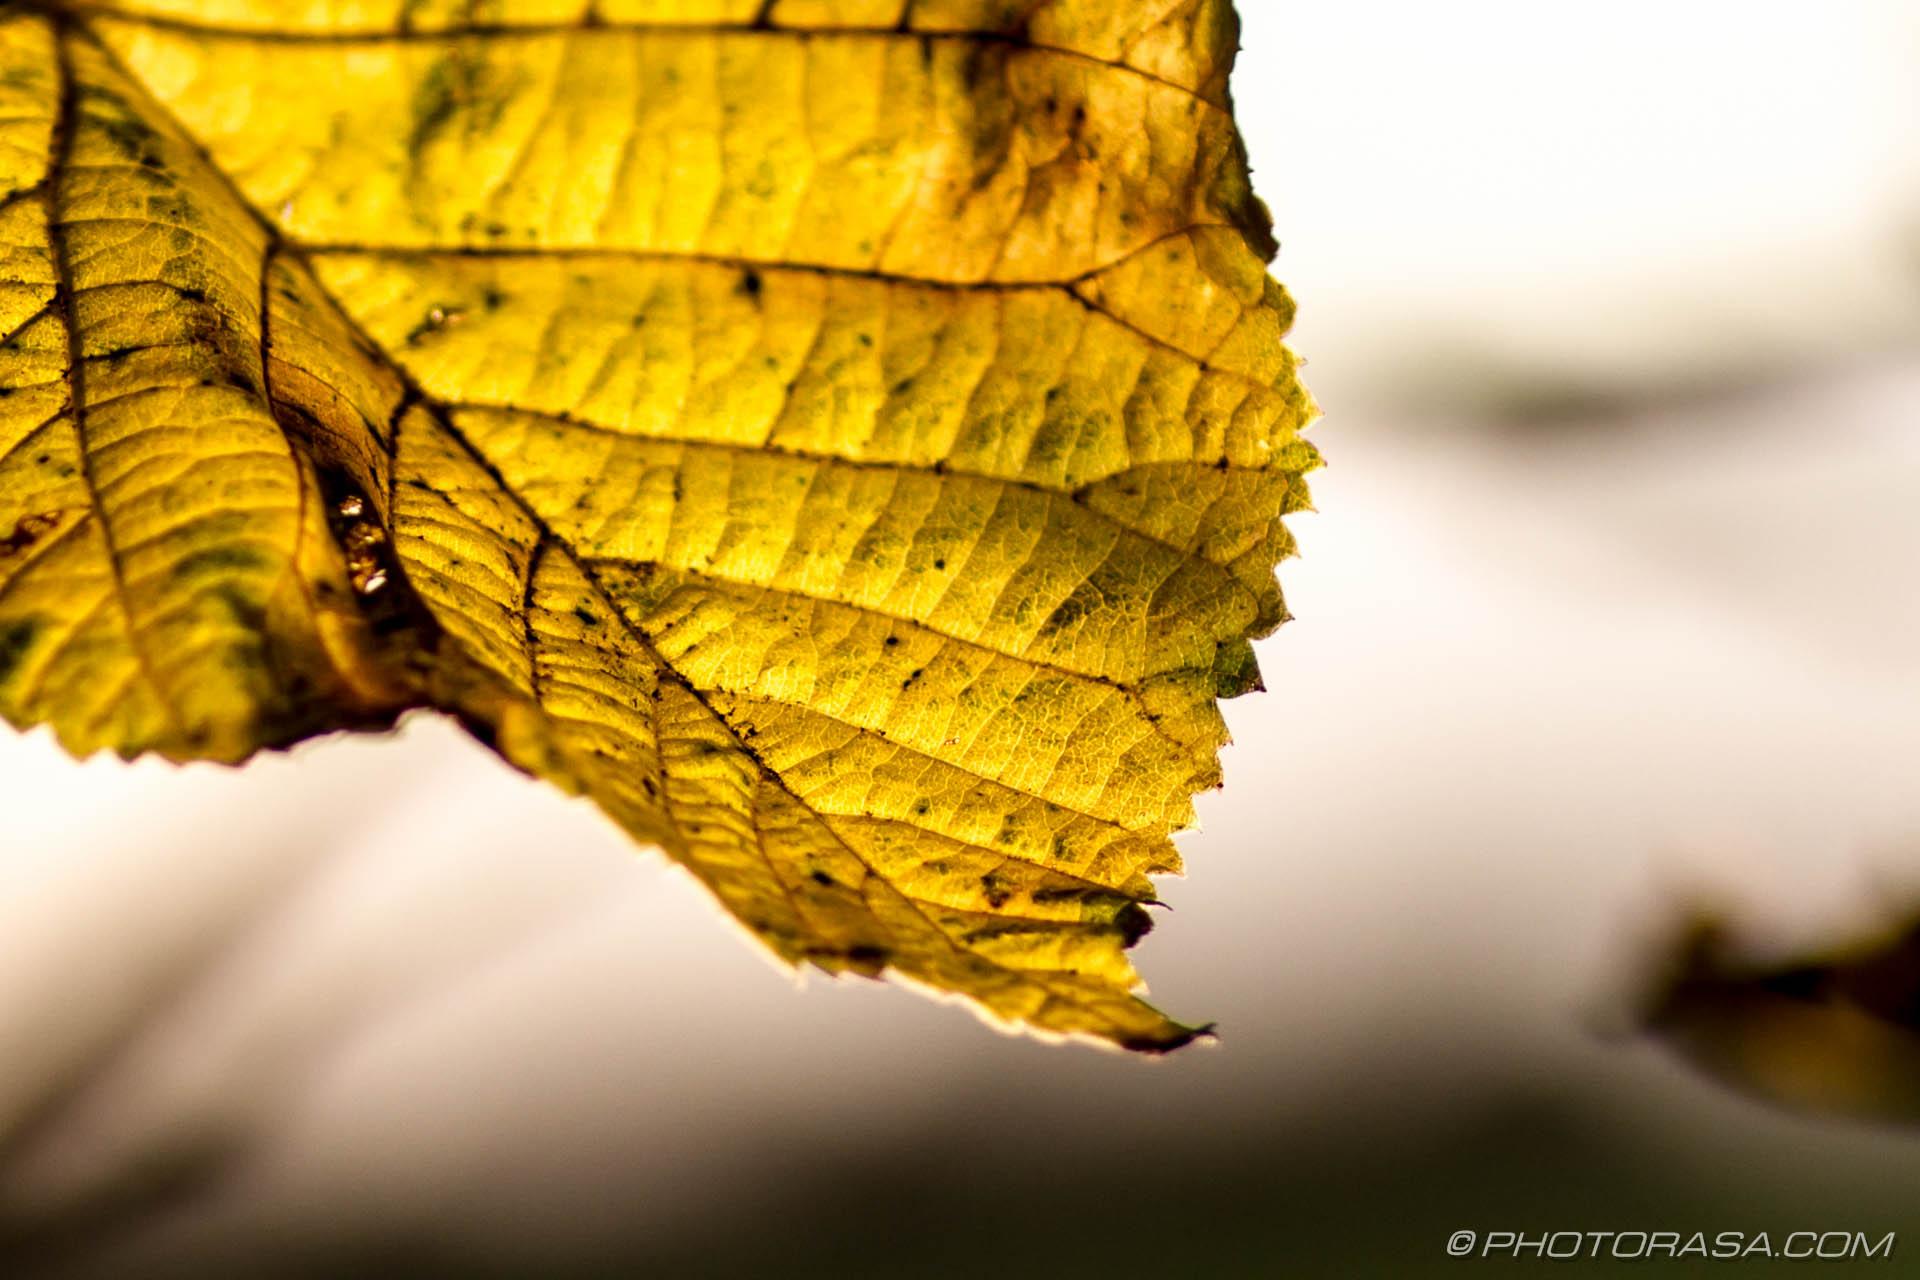 https://photorasa.com/leaves/yellow-autumn-leaf/